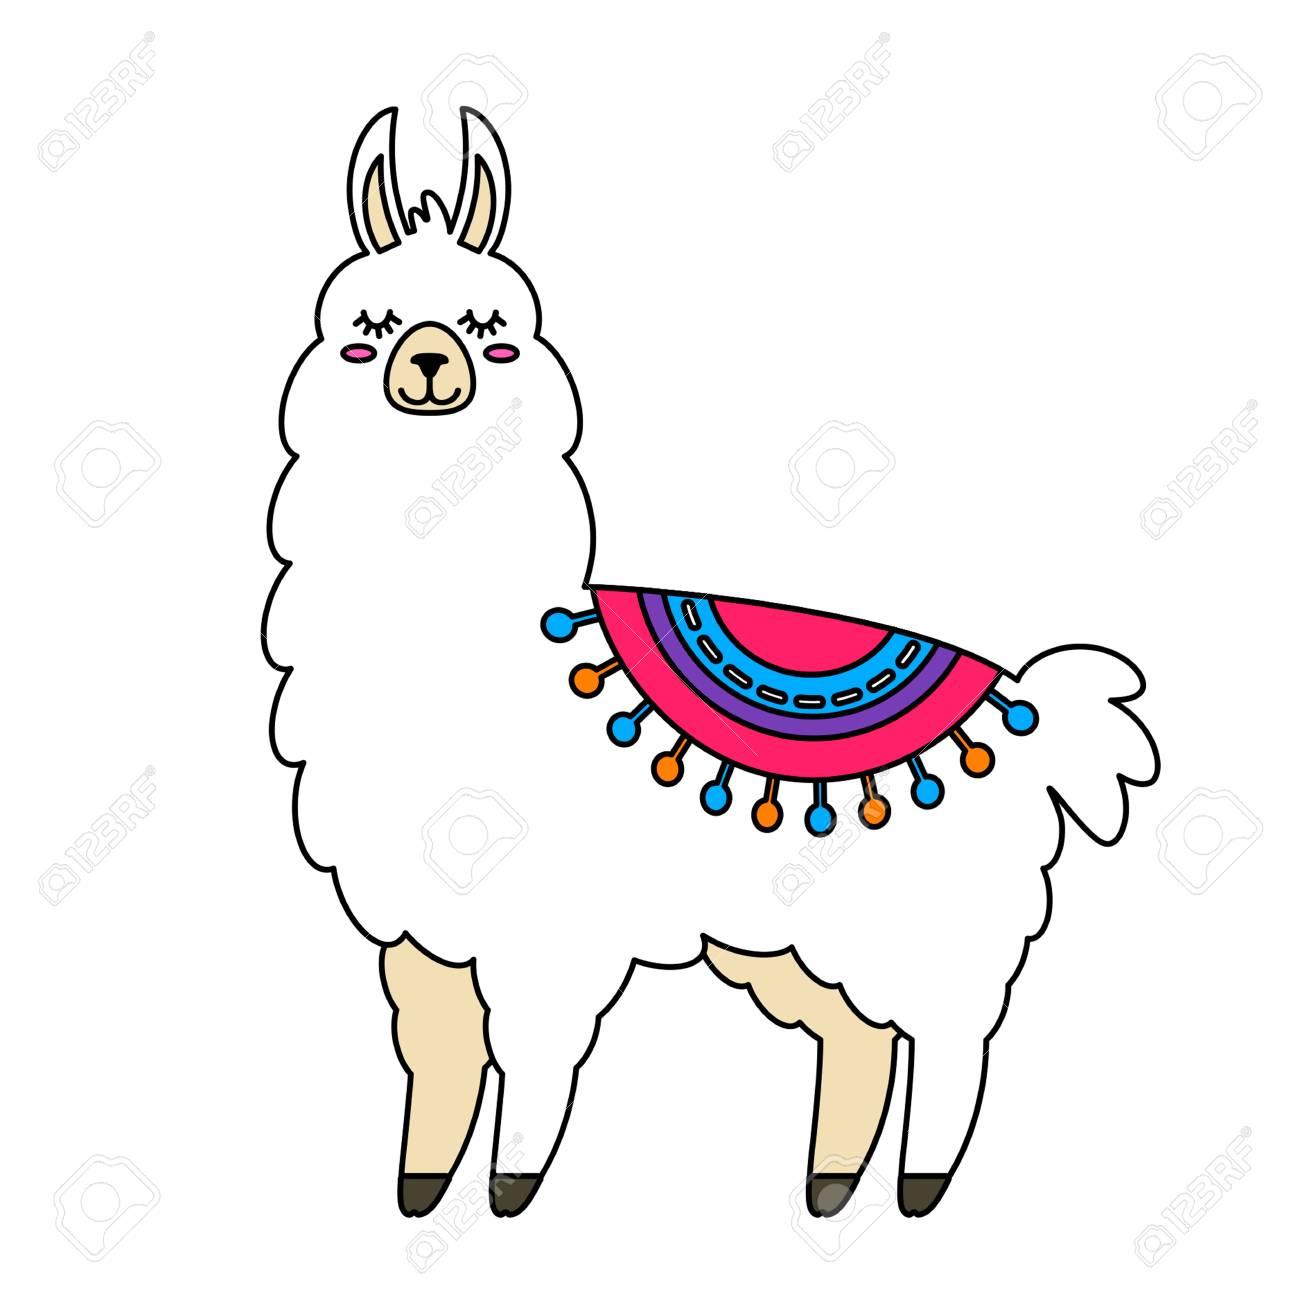 Funny llama alpaca in a cartoon style isolated flat vector illustration.